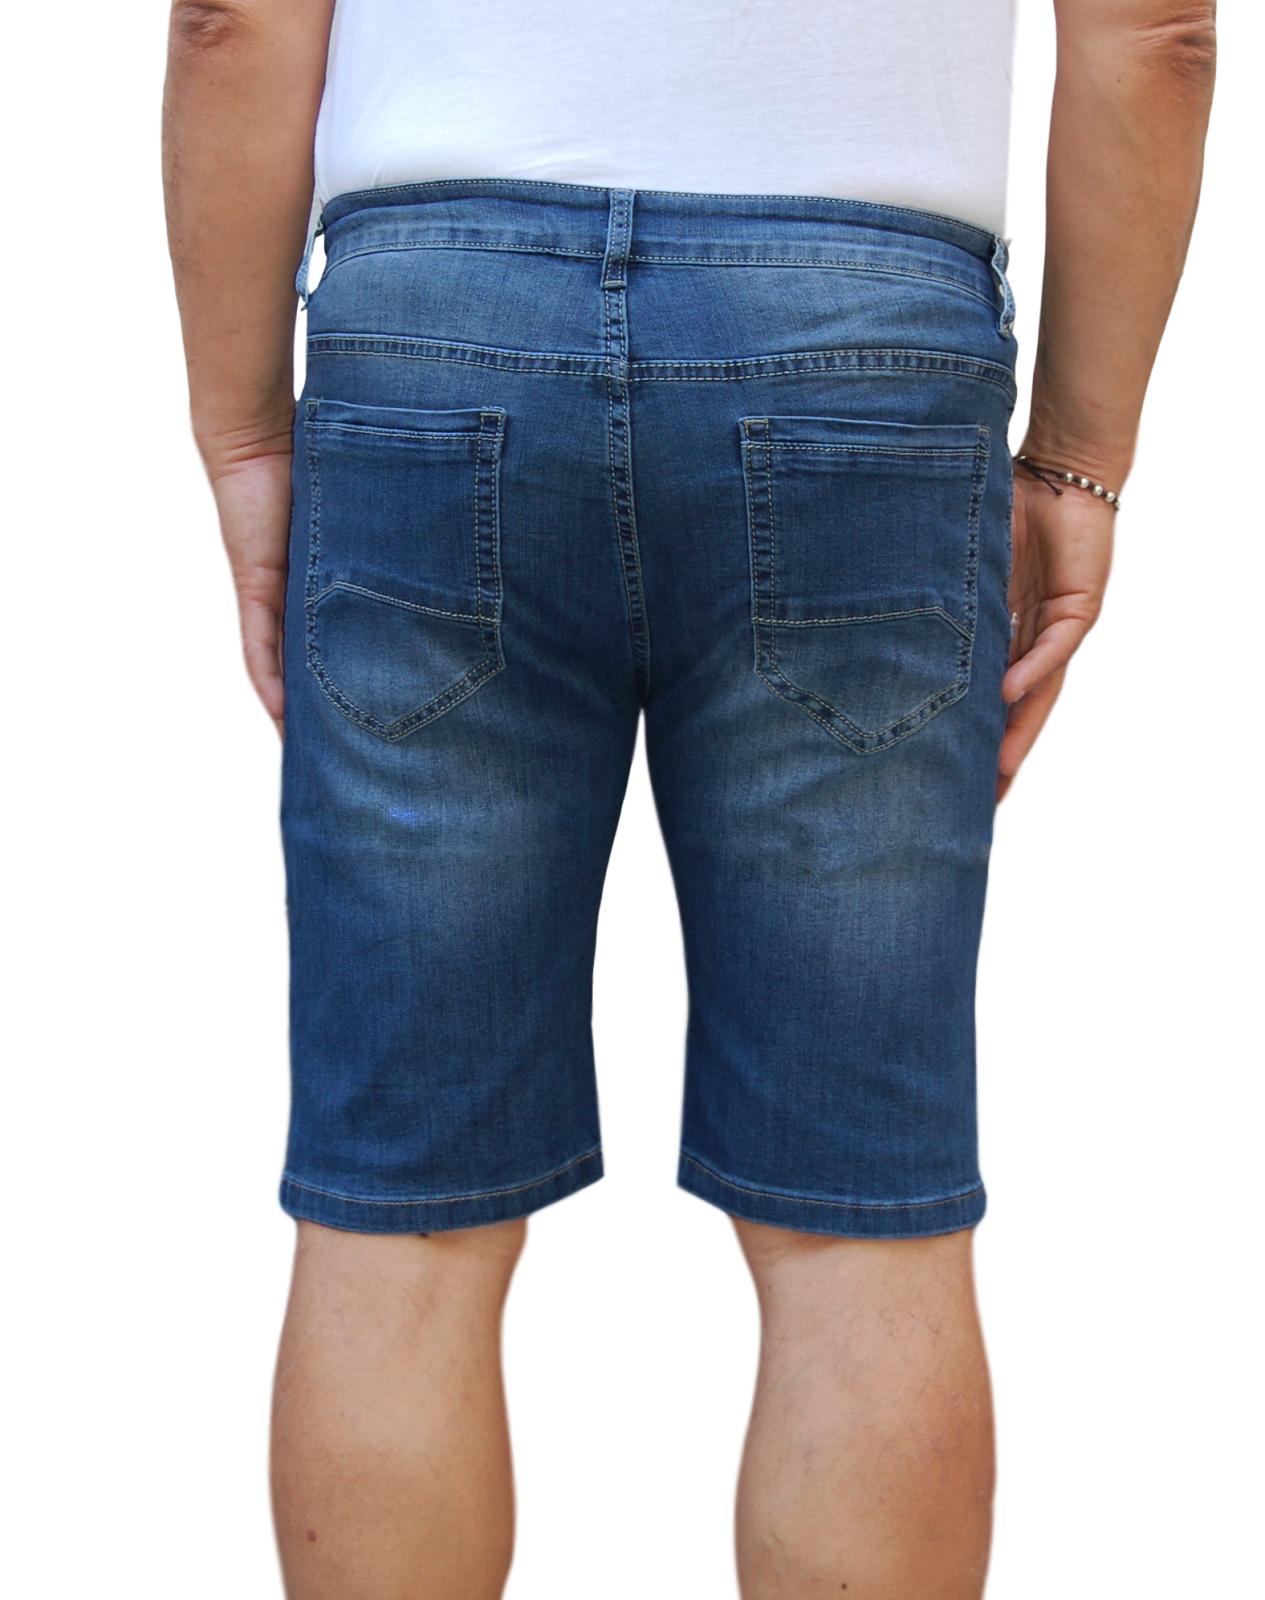 Bermuda-Uomo-Jeans-Denim-Corto-Tasche-America-Pantaloncino-Blu-Shorts-Casual-t miniatura 16